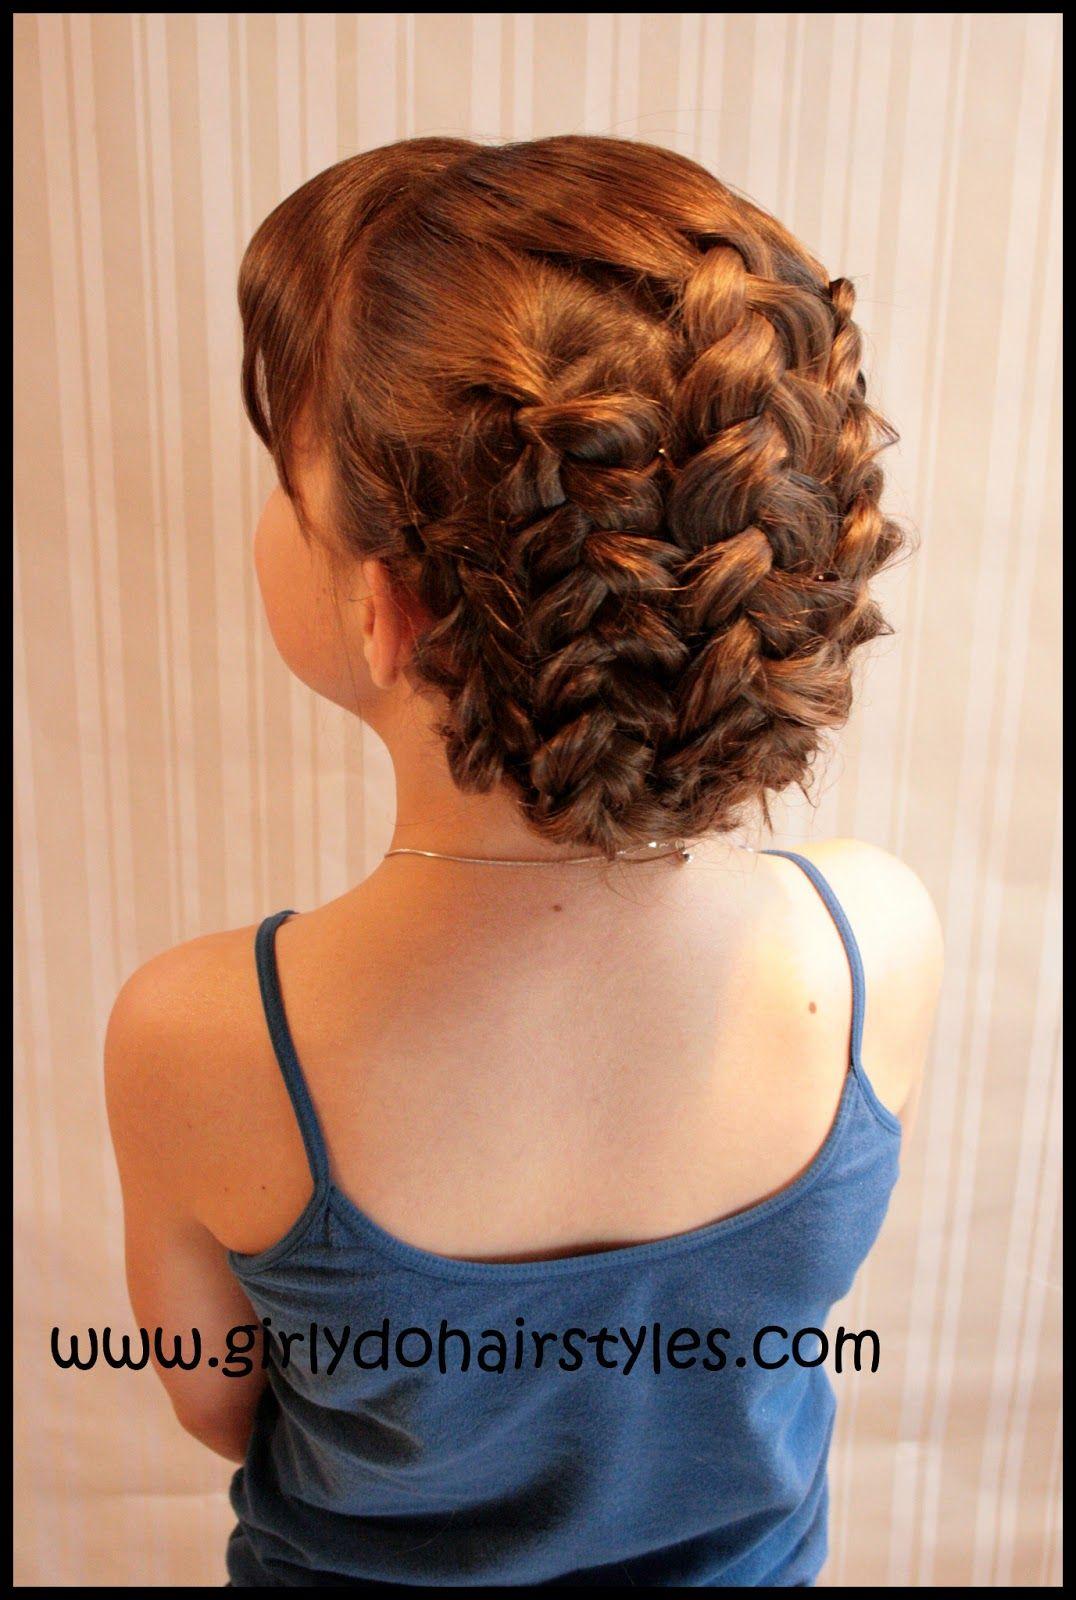 girly hairstyles jenn braided